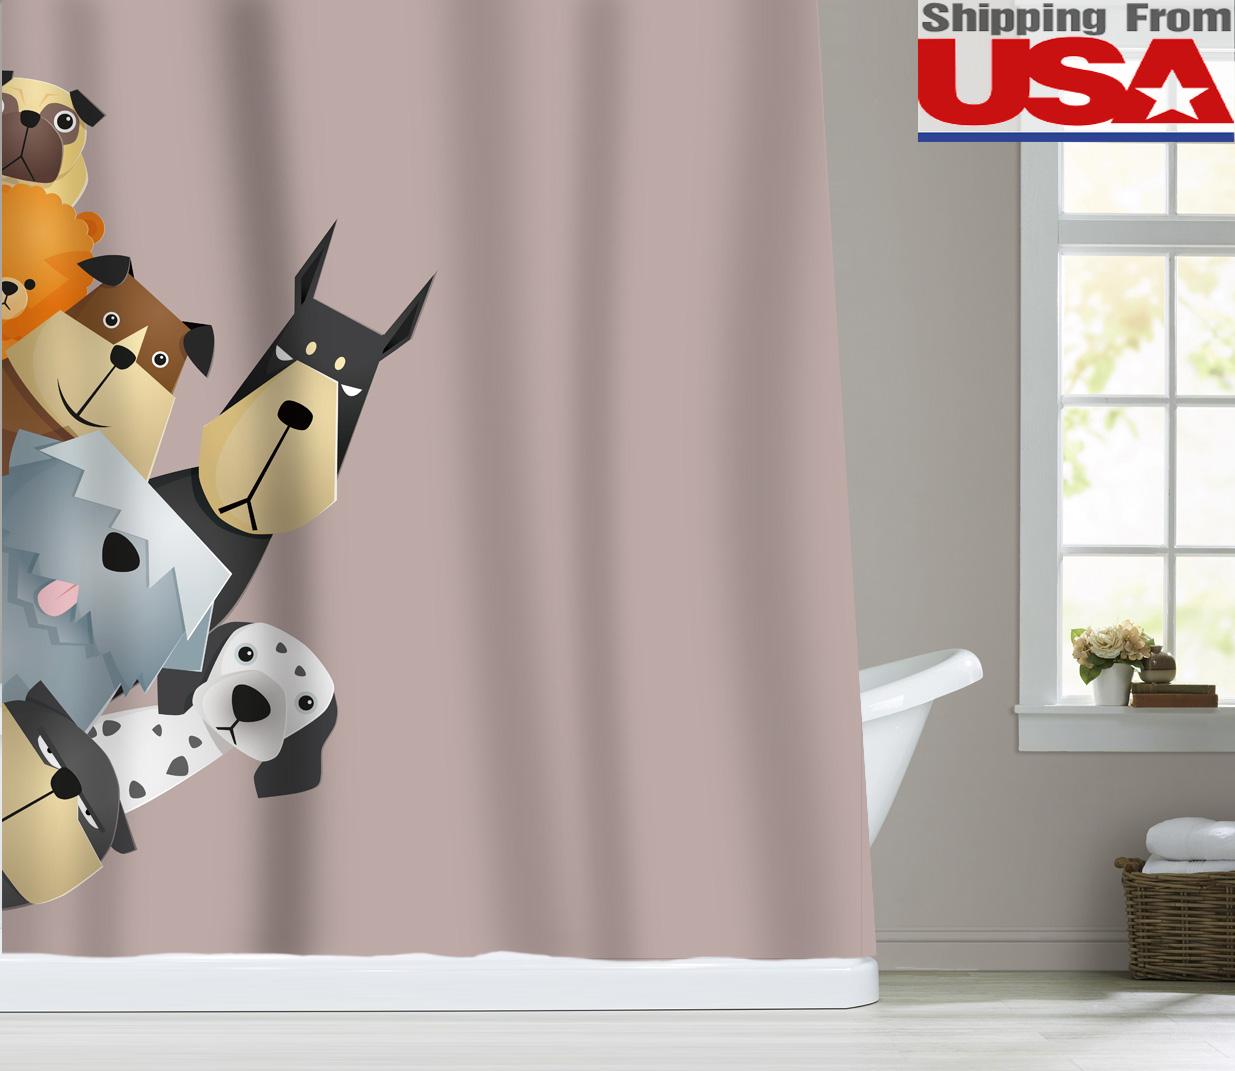 Fabric Animal Dog Cat Kid Shower Curtain Set Bathroom Bathtub Decor Hook Hanger